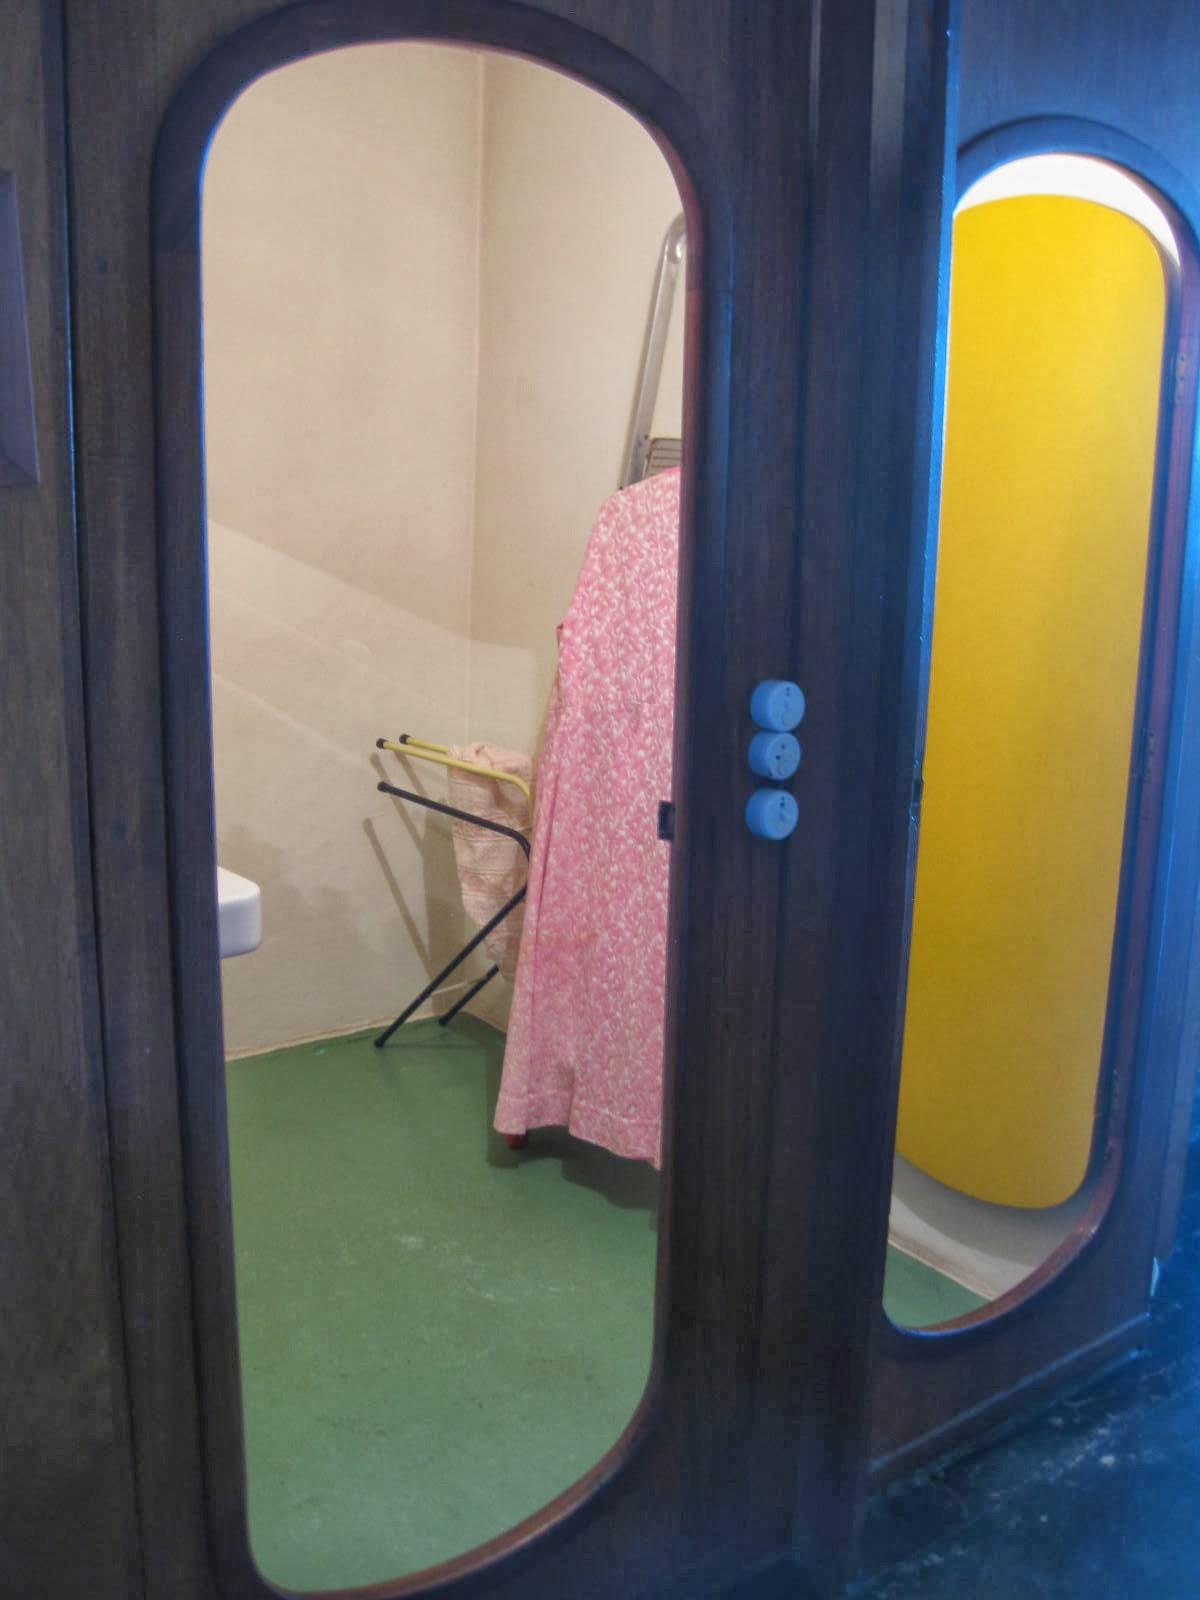 beautiful salle de bain charlotte perriand 5 portessallebaindelamaisonradieusejpg - Salle De Bain Charlotte Perriand